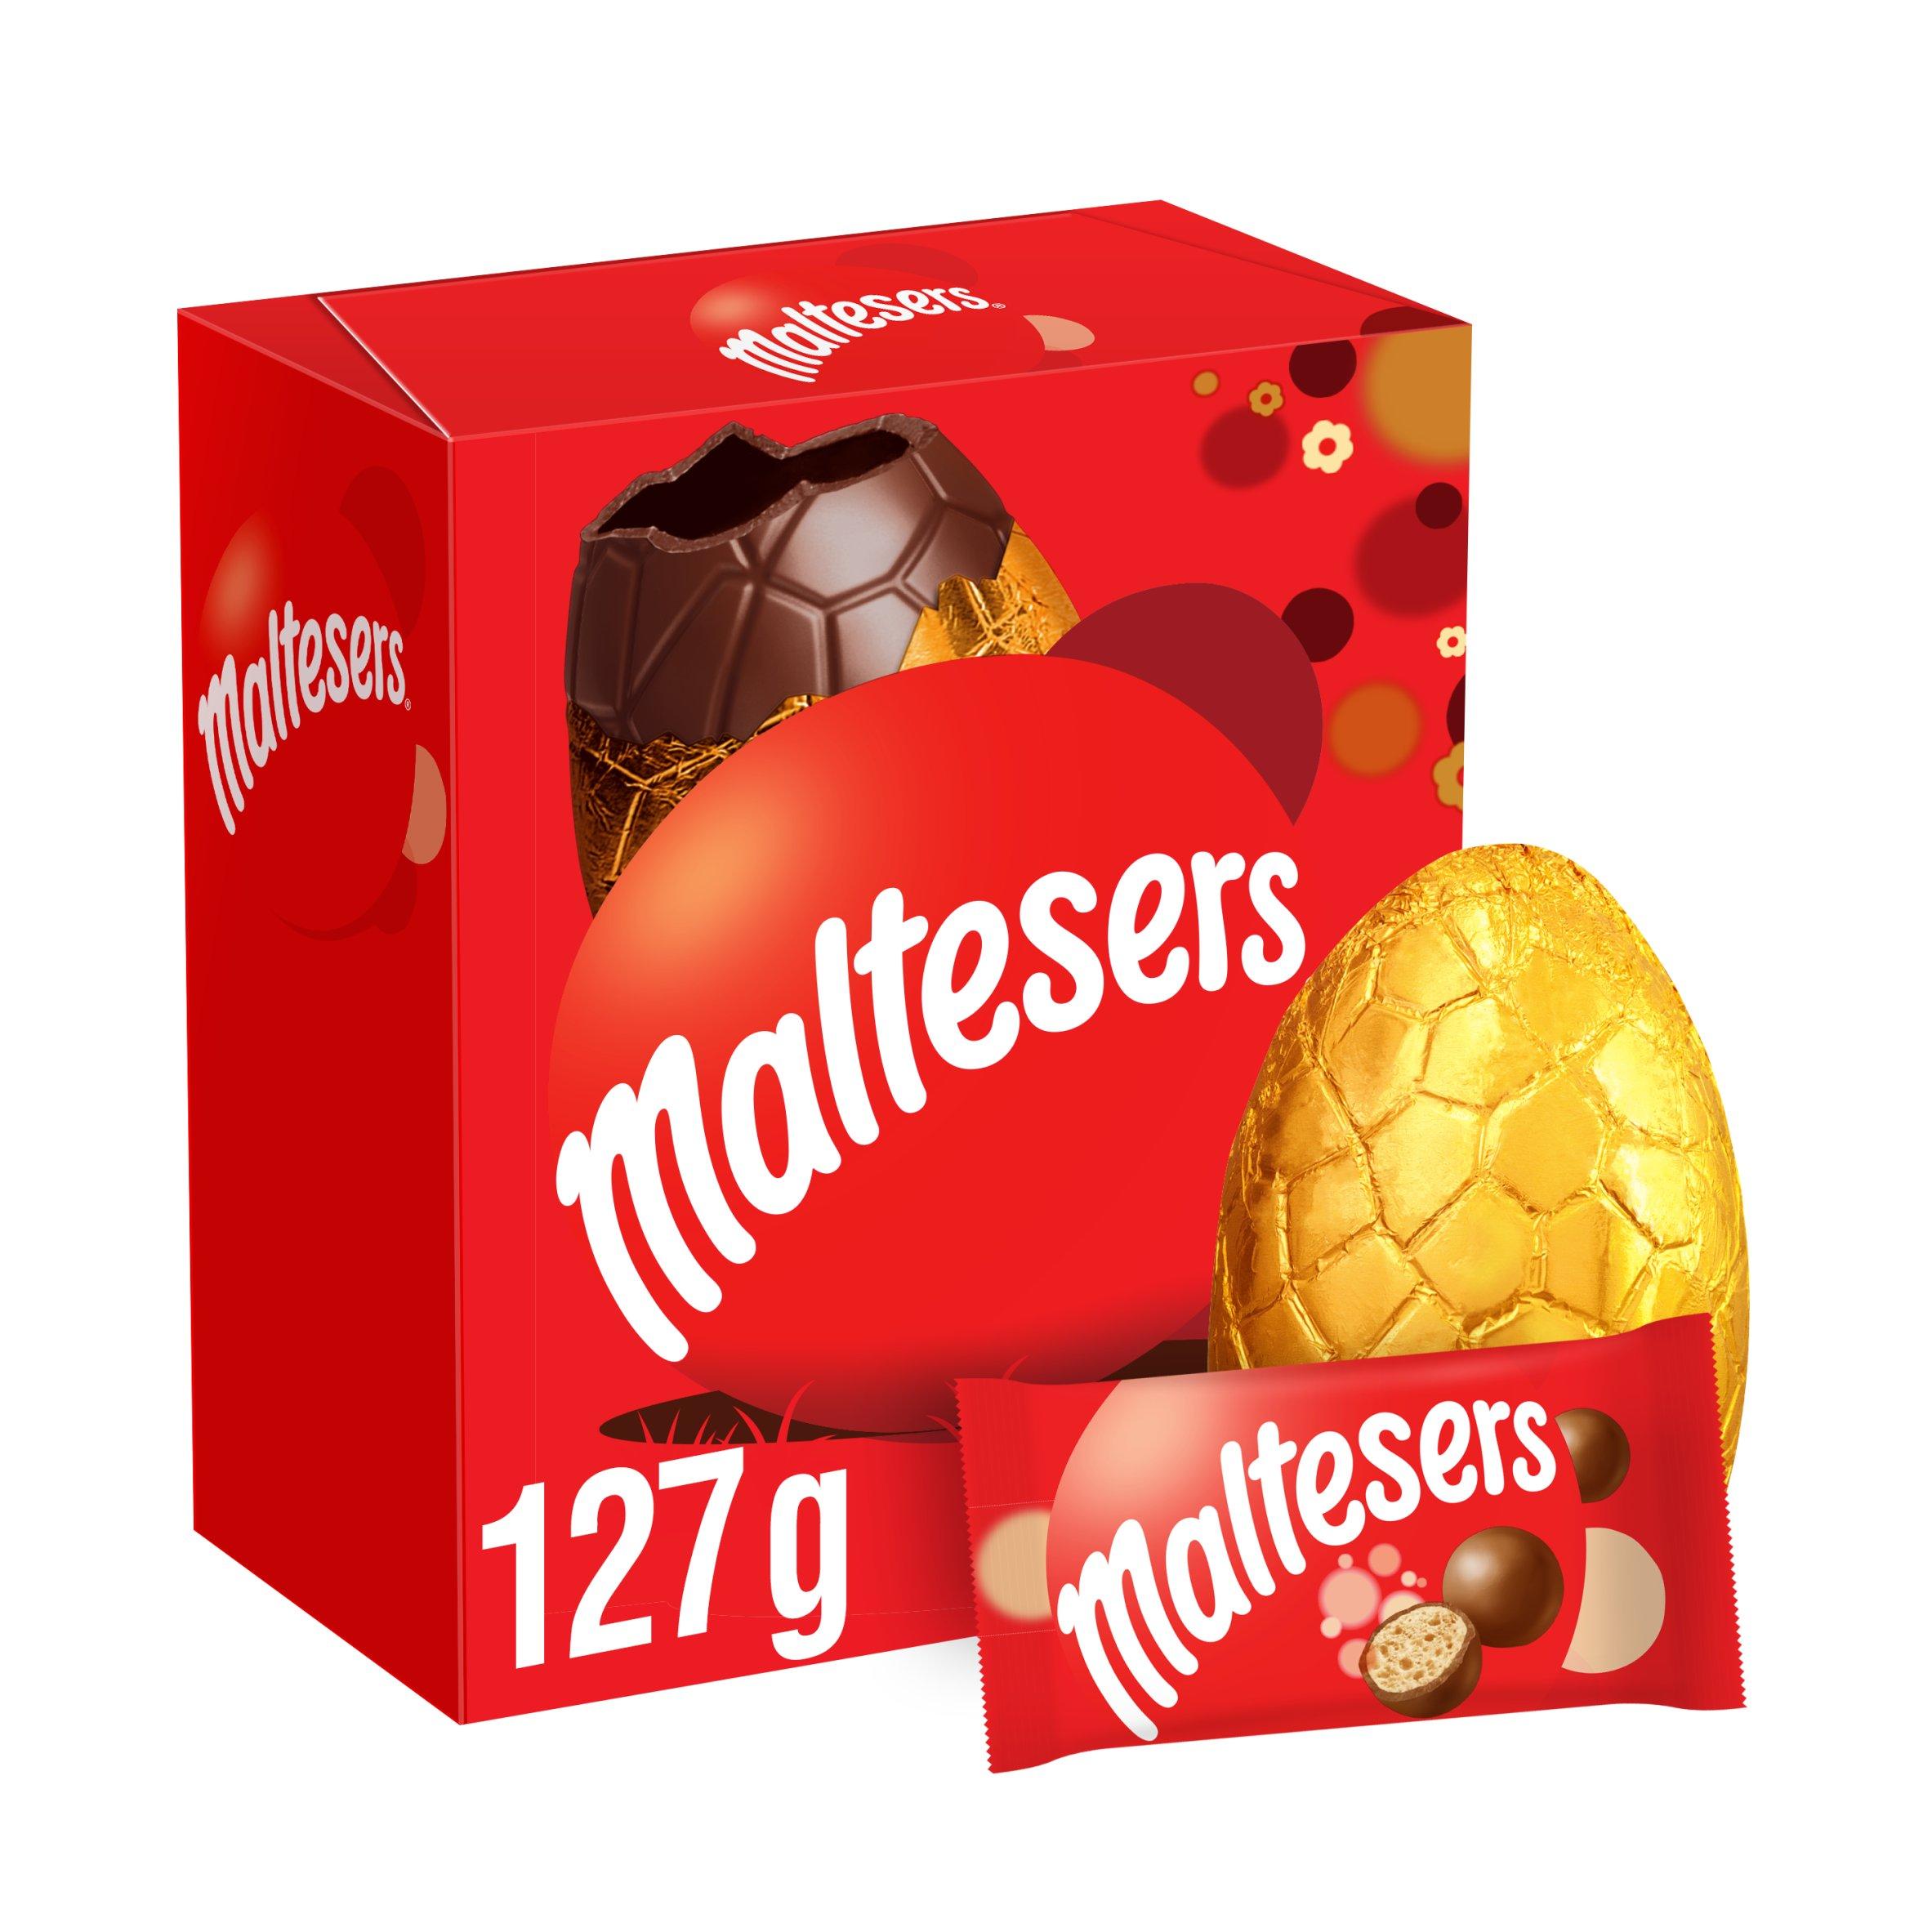 Maltesers Milk Chocolate Easter Egg & Chocolate 127G